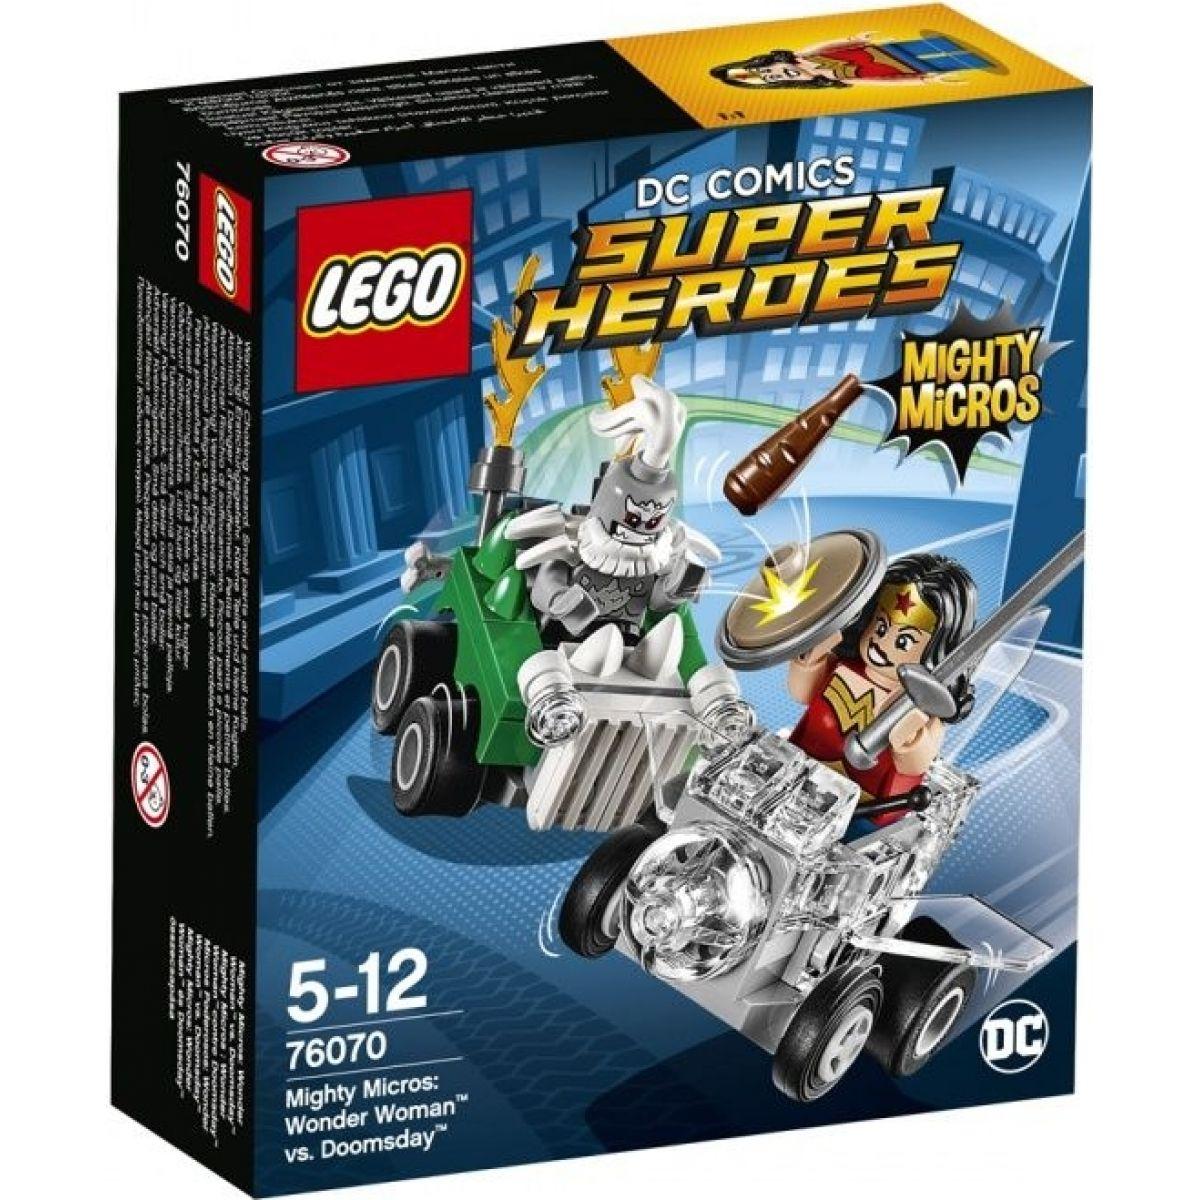 LEGO Super Heroes 76070 Mighty Micros: Wonder Woman vs- Doomsday